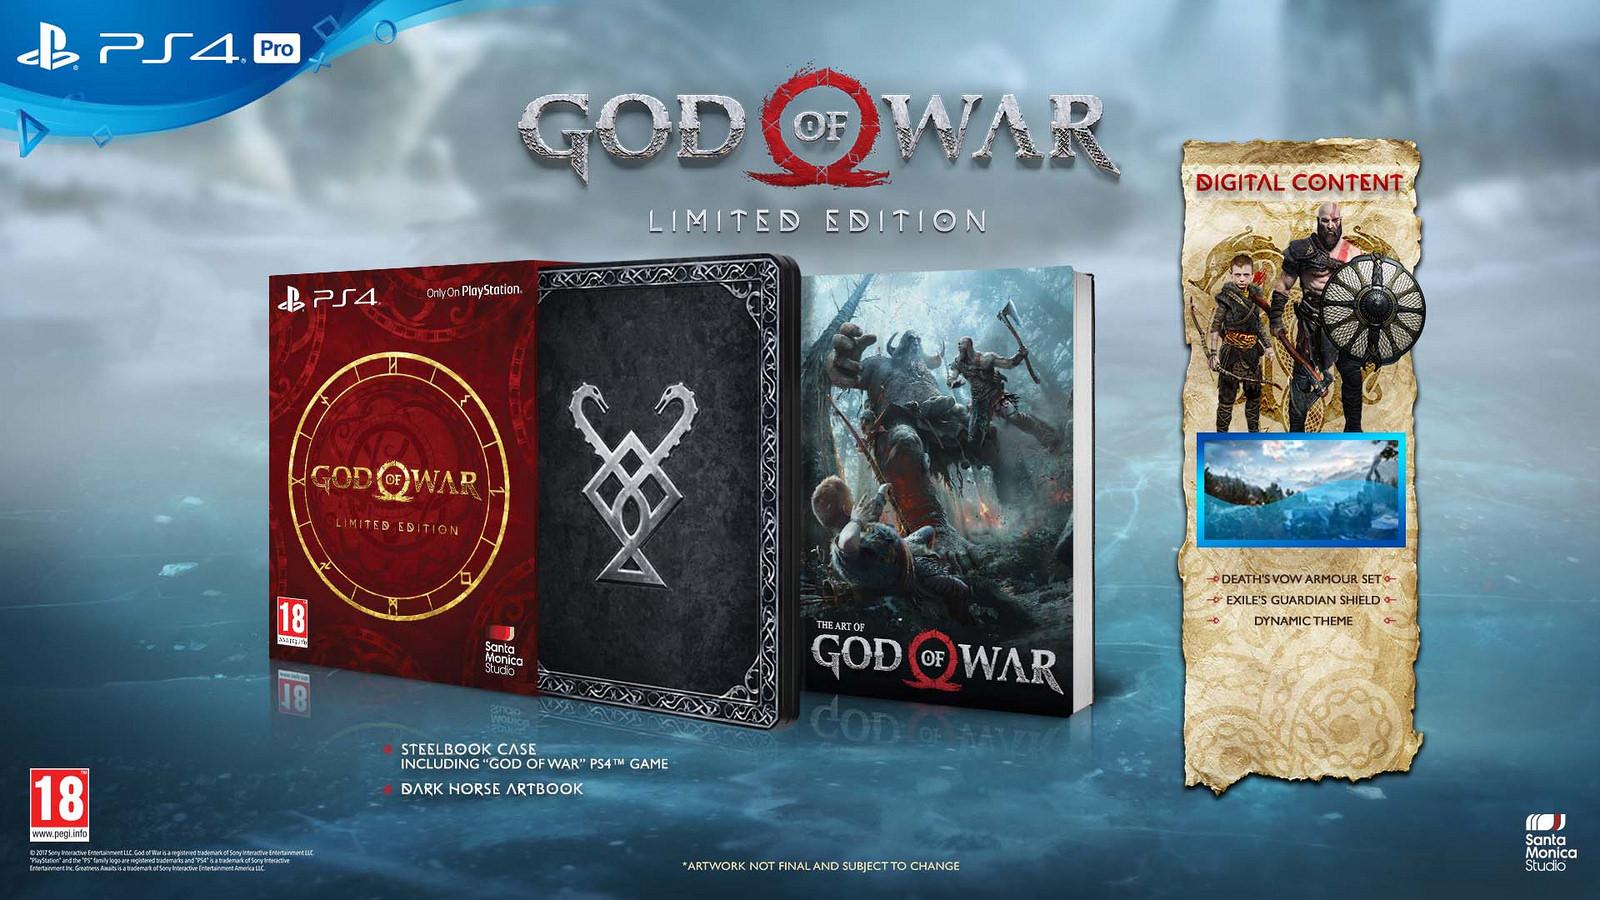 [Vorbestellung] God of War Limited Edition (Playstation 4 exclusive)